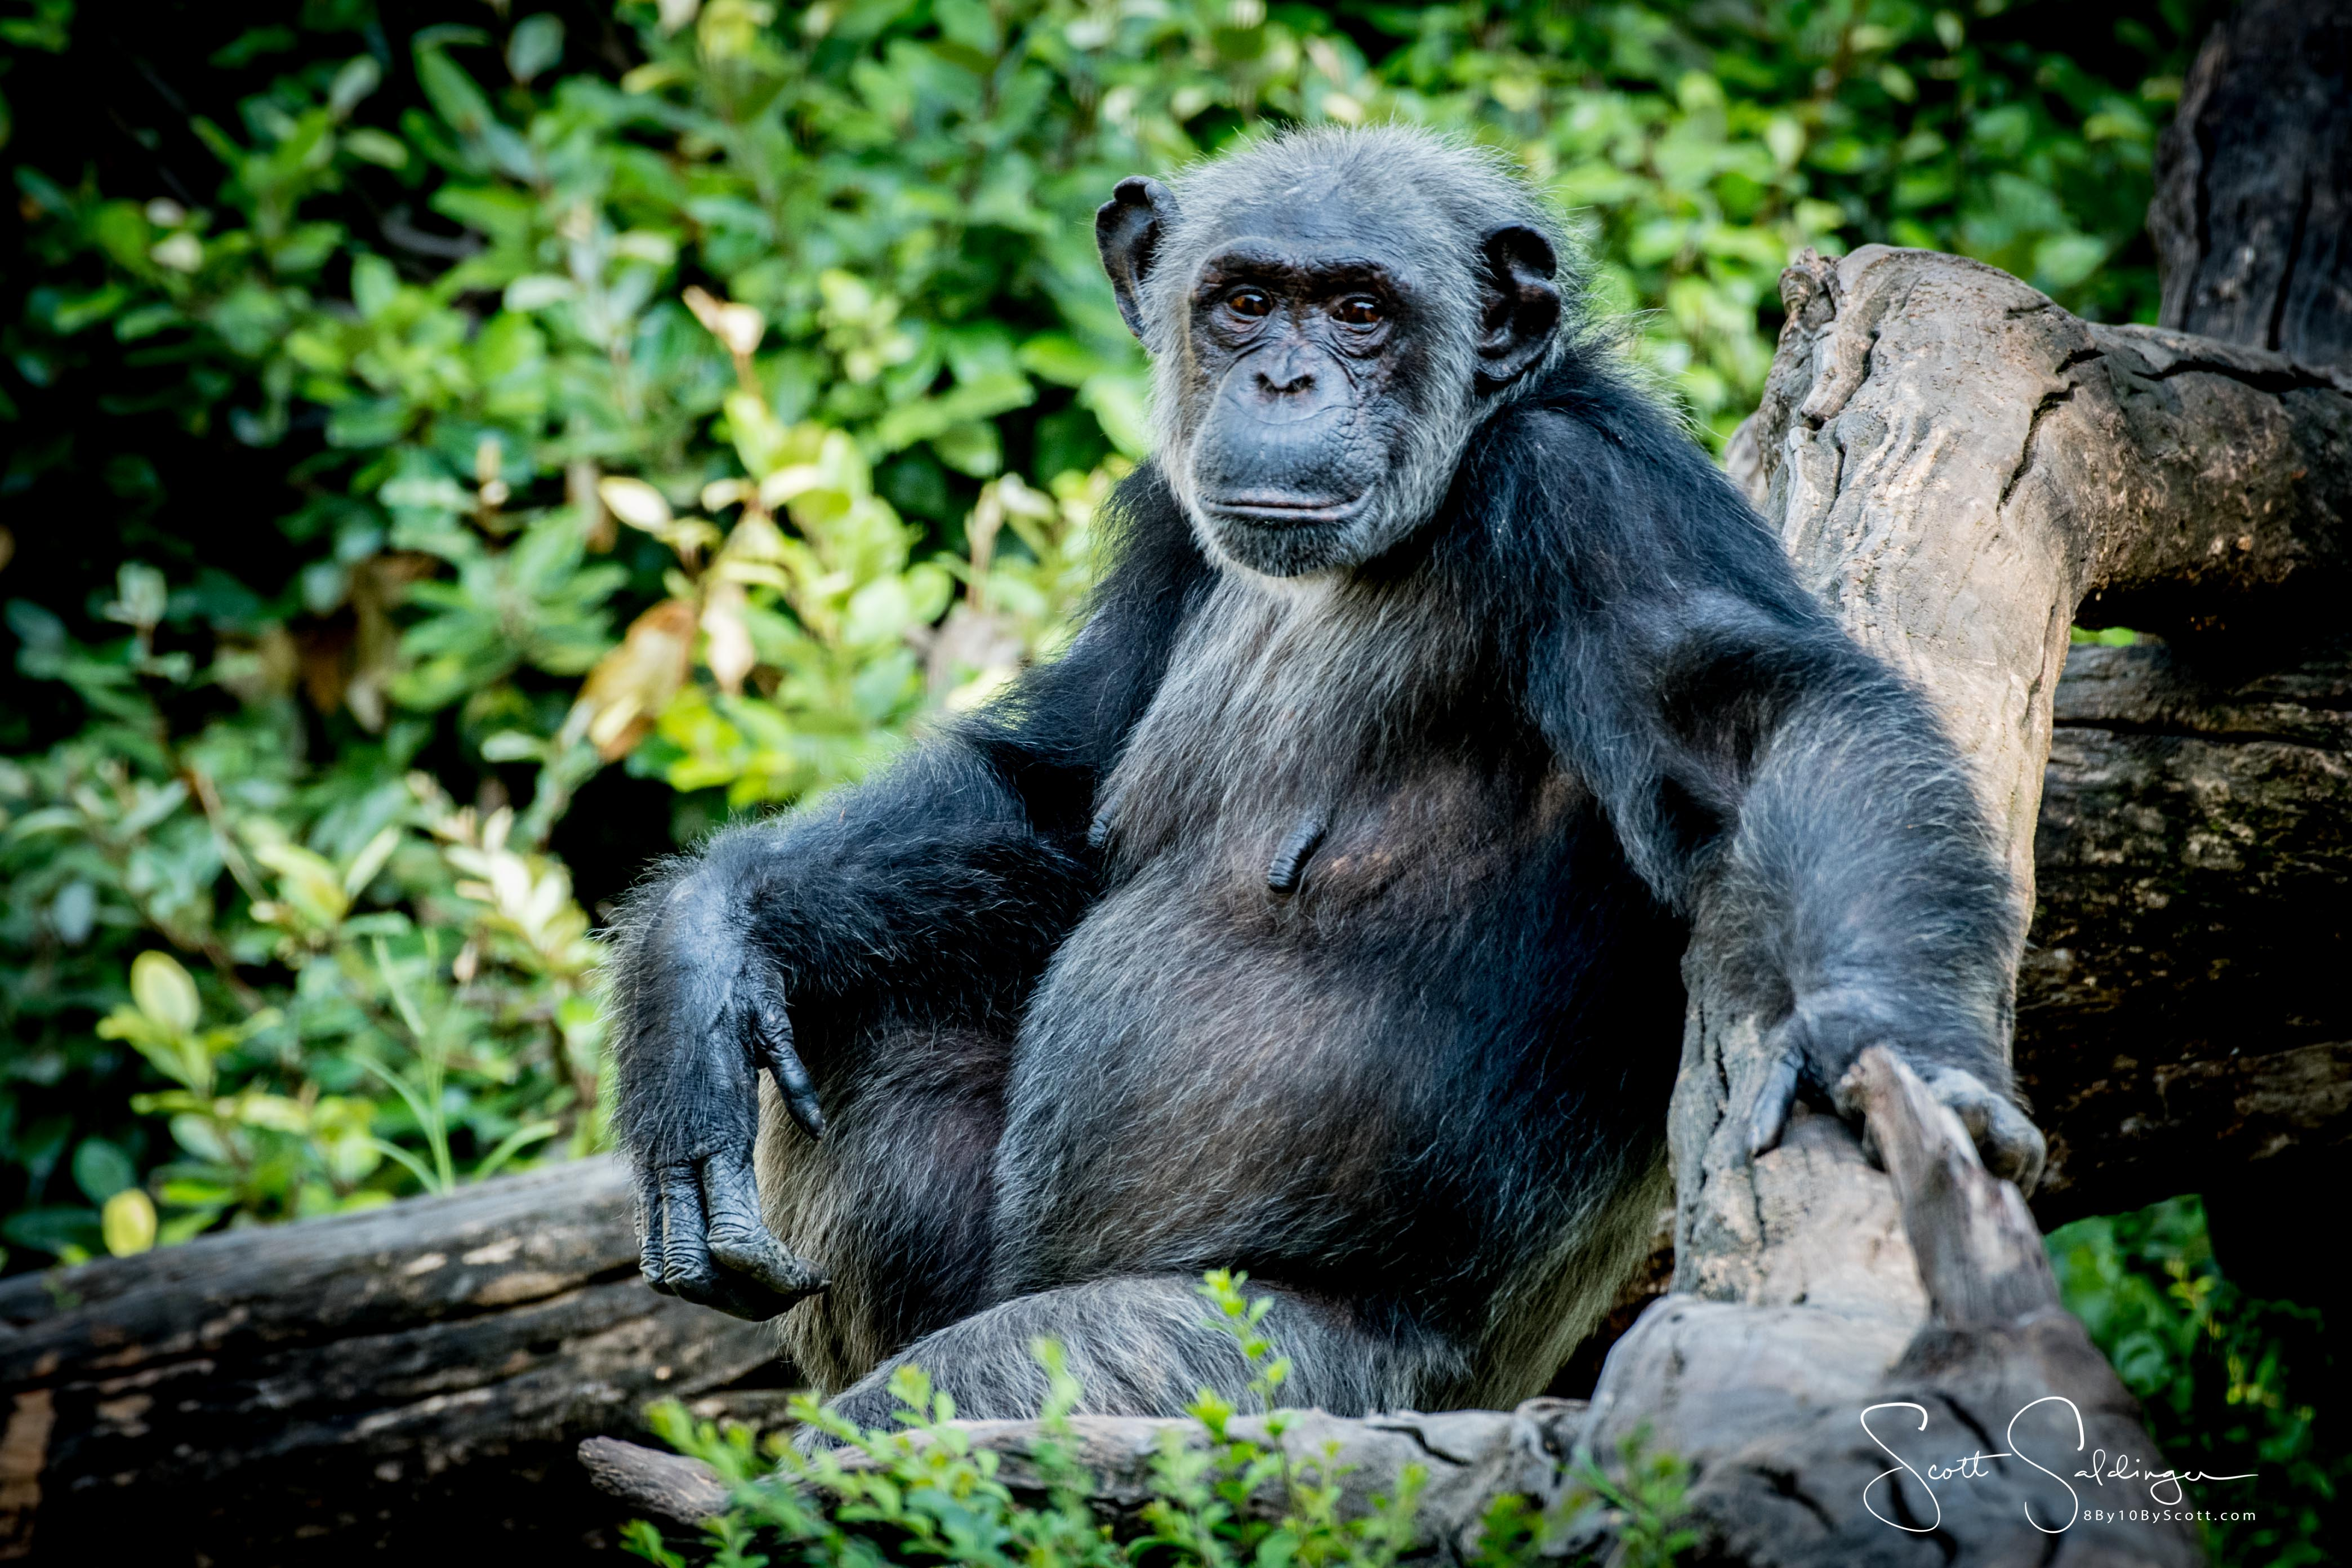 Apes-6124